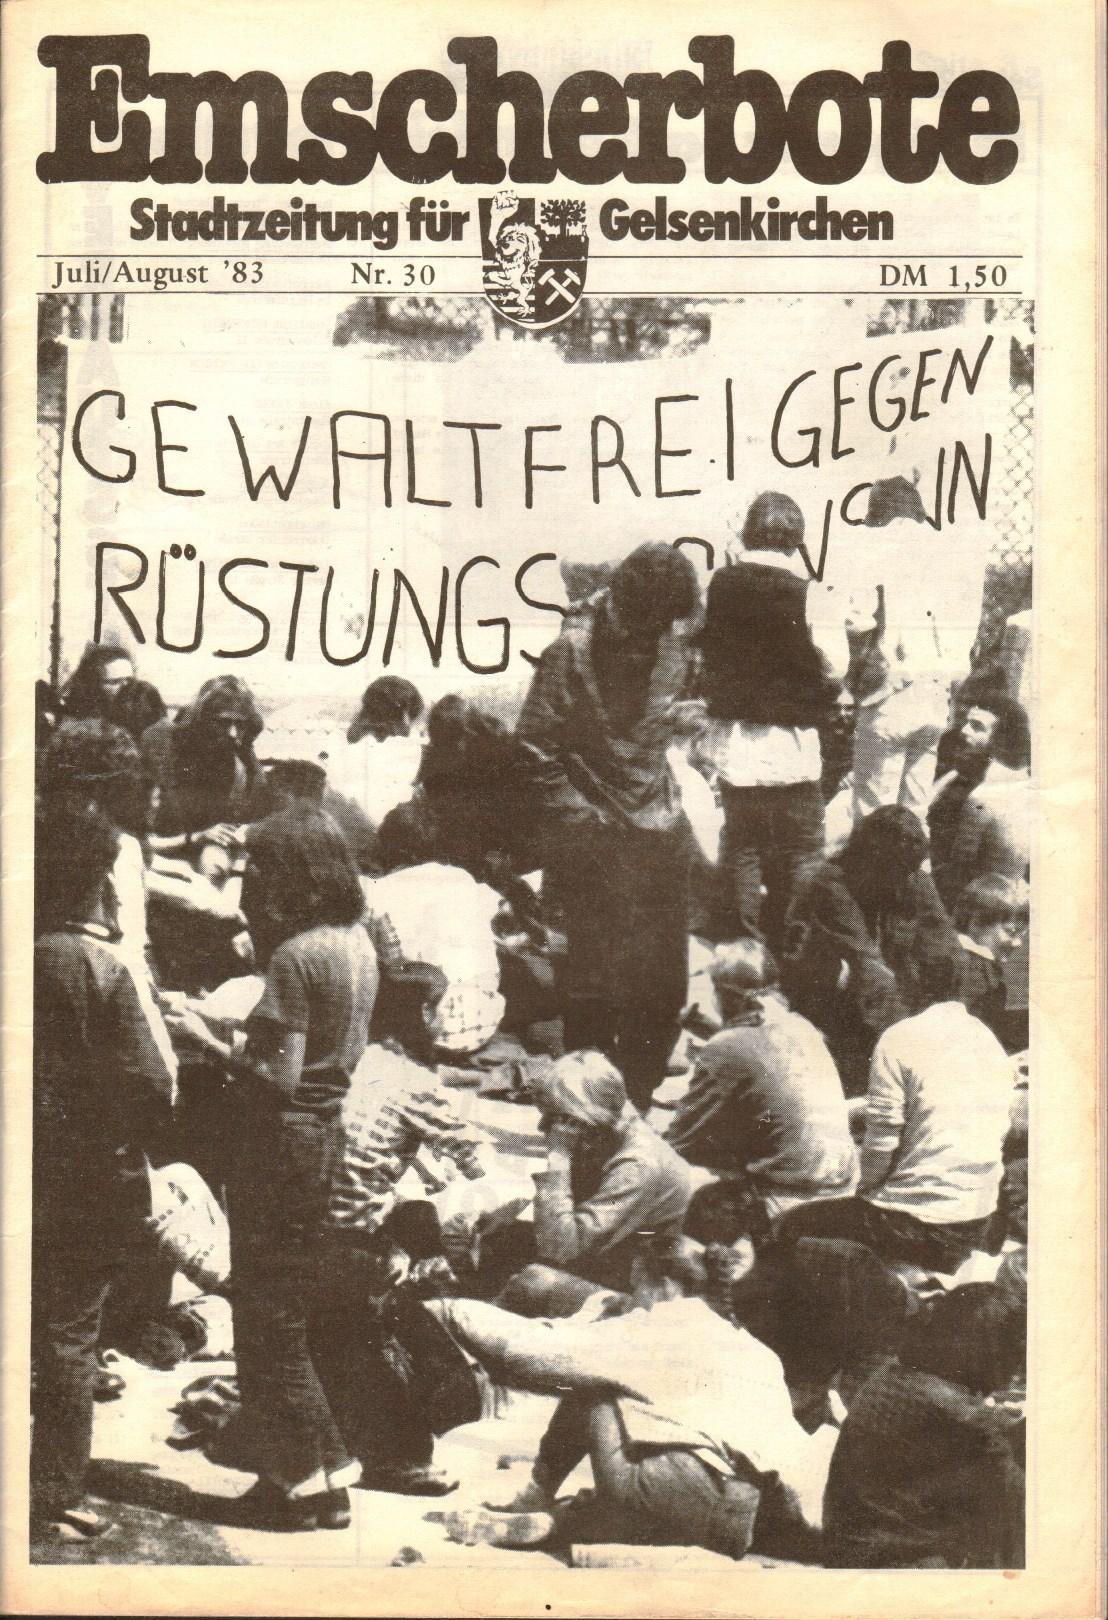 Gelsenkirchen_Emscherbote_1983_30_01